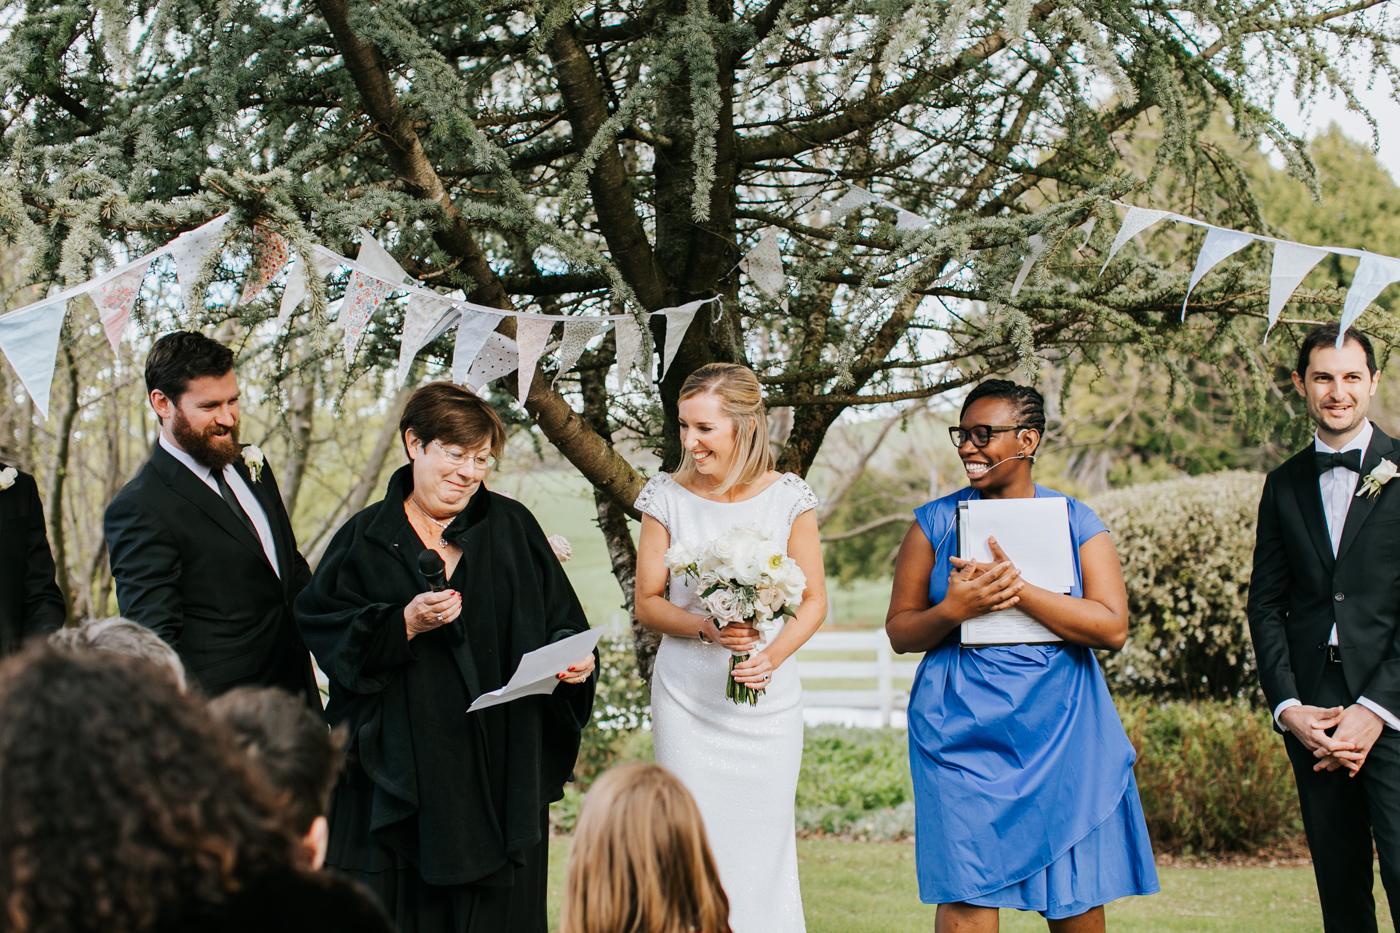 Bridget & James - Orange Country Wedding - Samantha Heather Photography-41.jpg